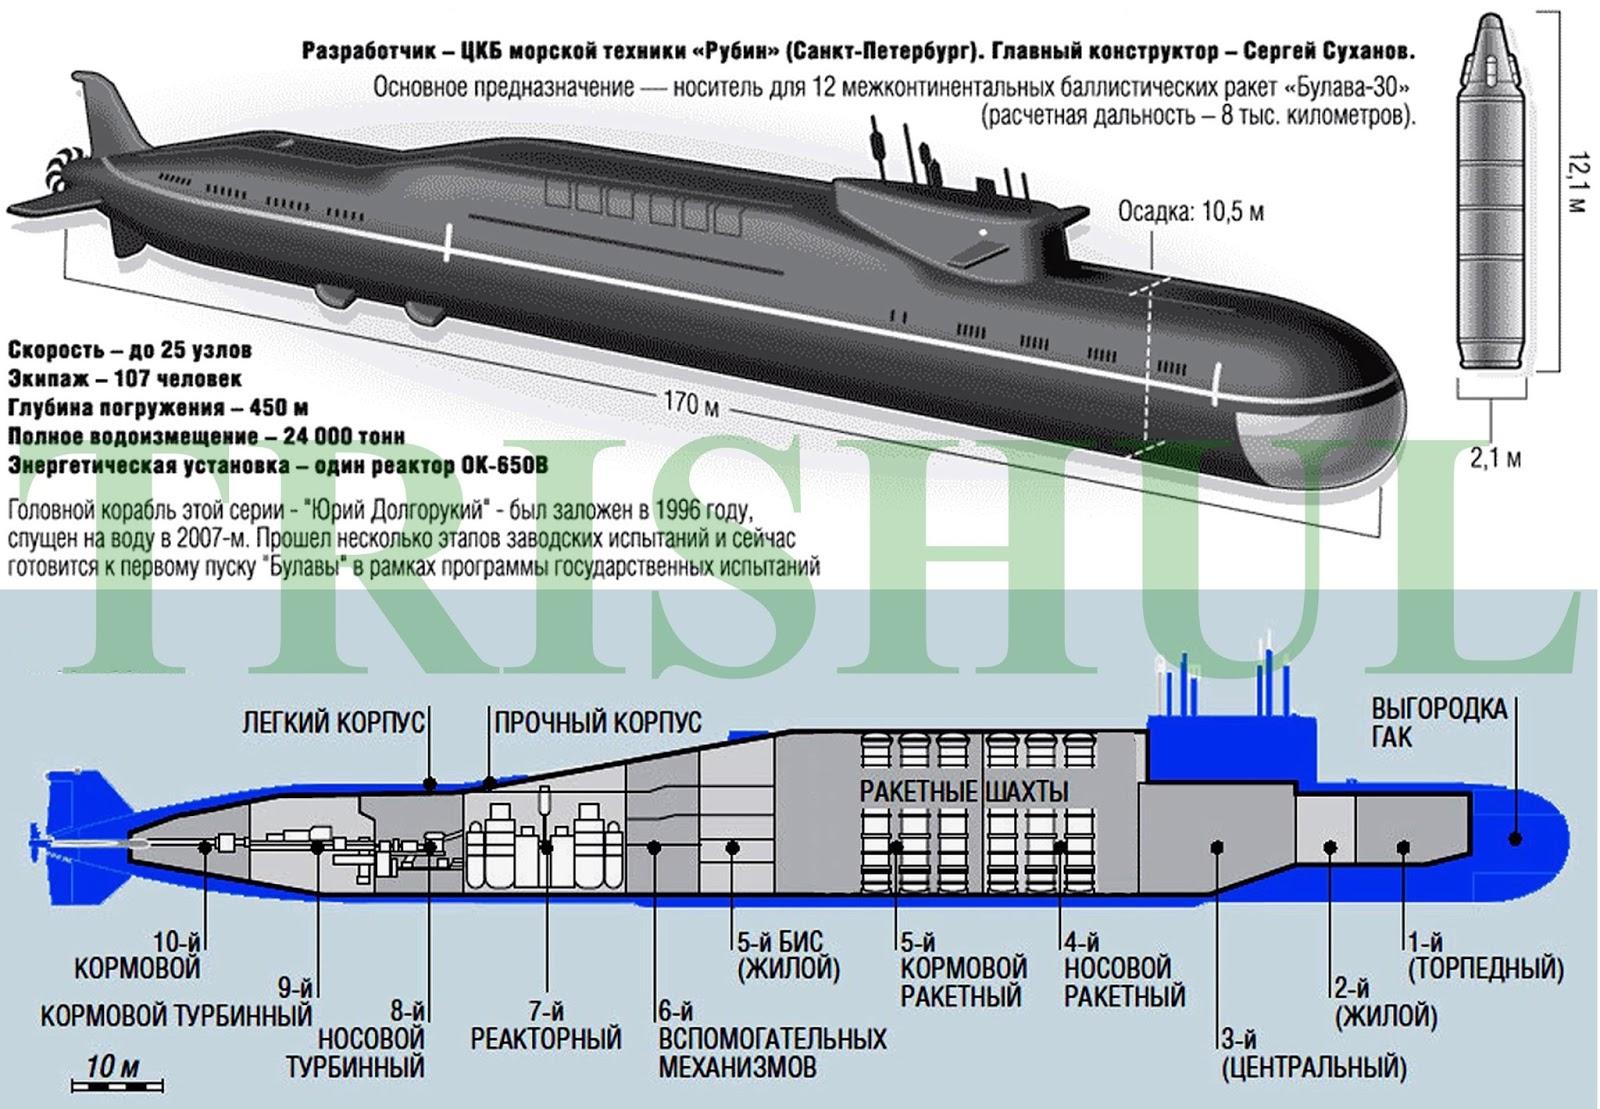 Indian Navy's projected S-5 SSBN Schematic.jpg